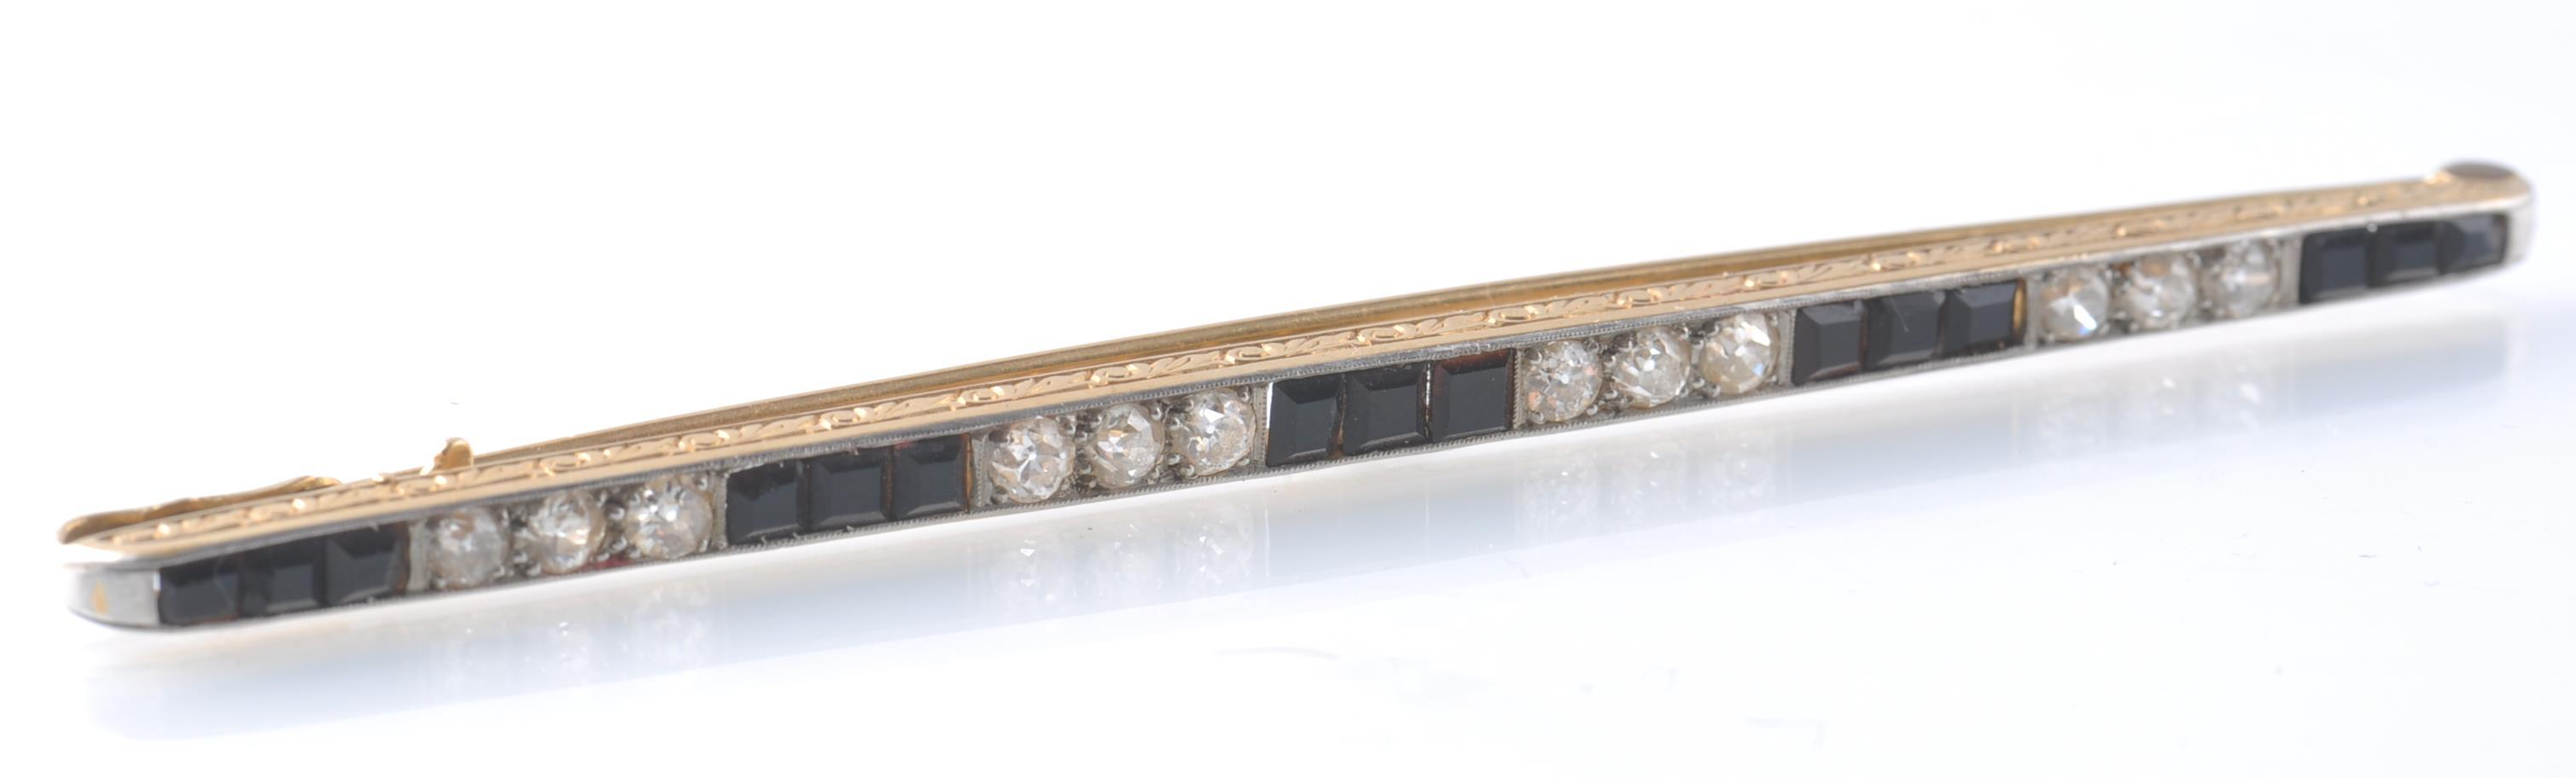 Lot 82 - 1930'S ART DECO LARGE BLACK ONYX AND DIAMOND BAR B